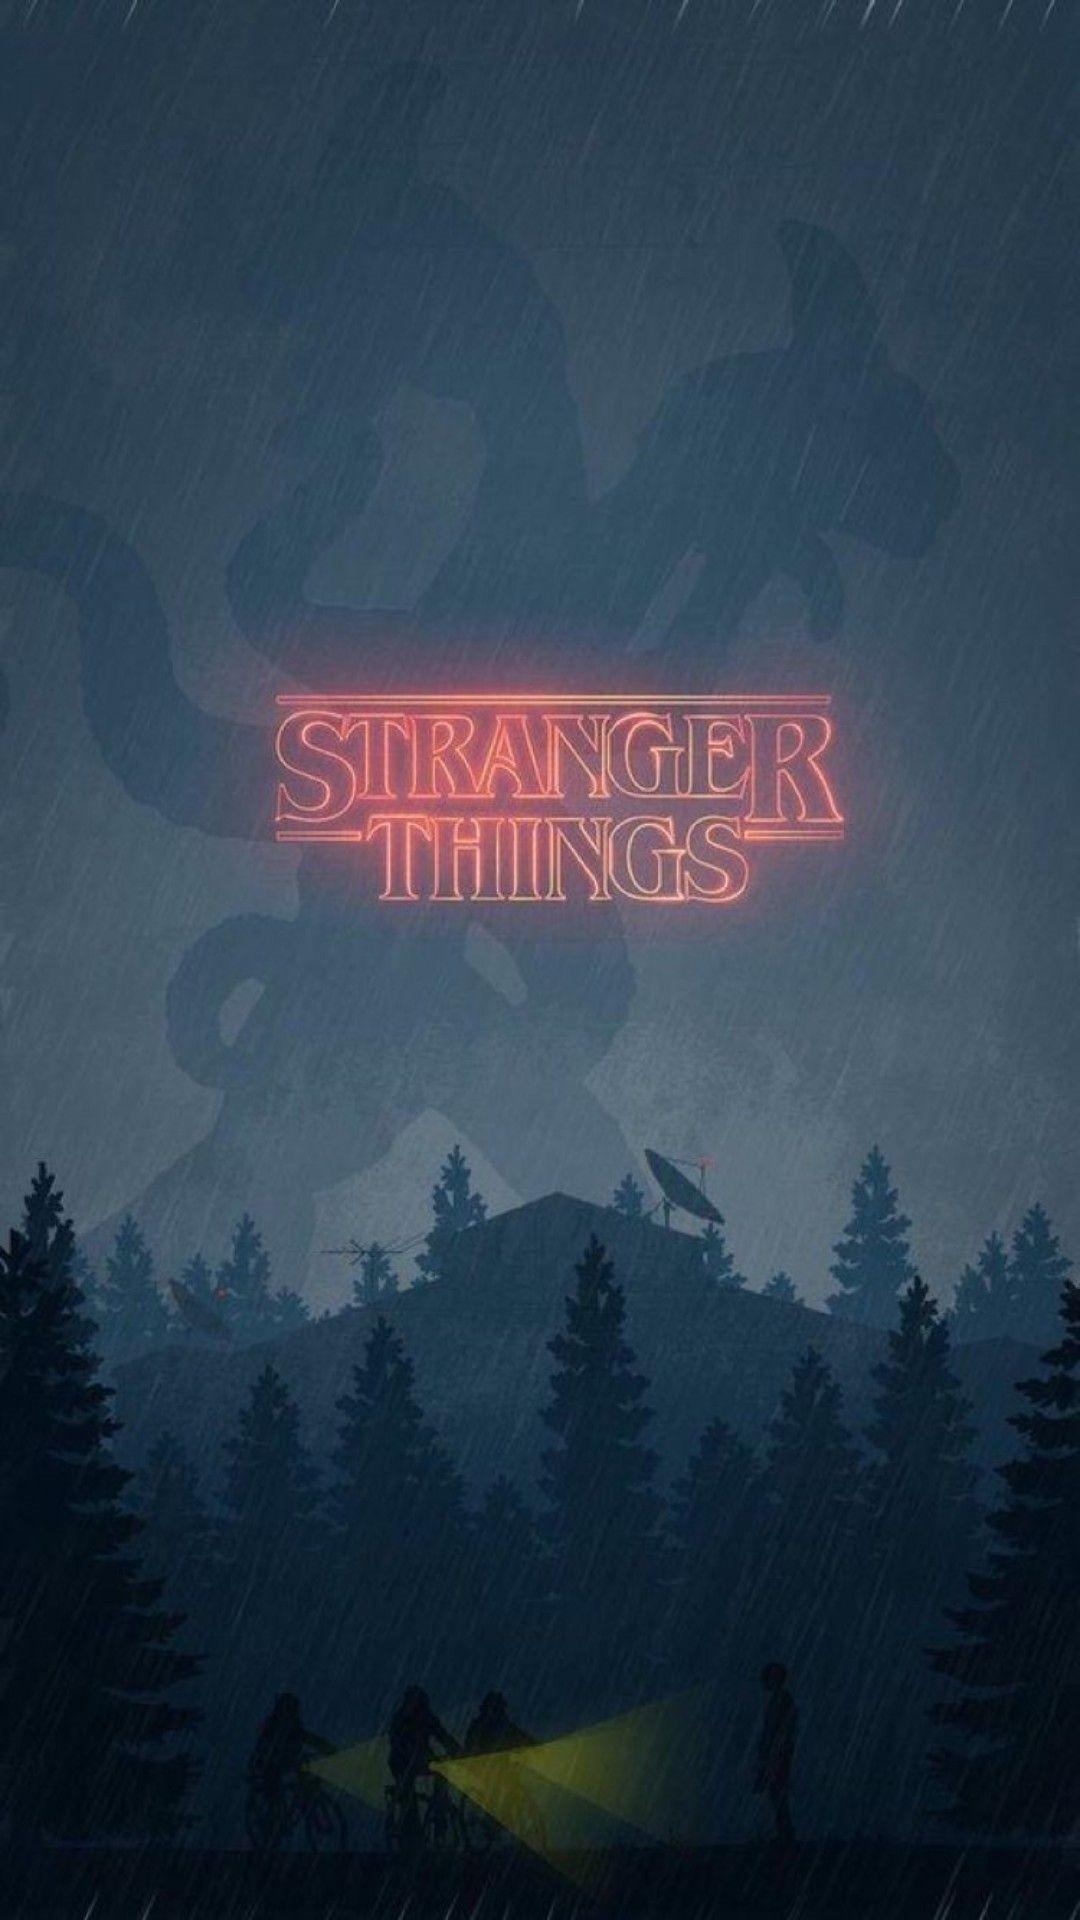 Stranger Things iphone 8 plus wallpaper